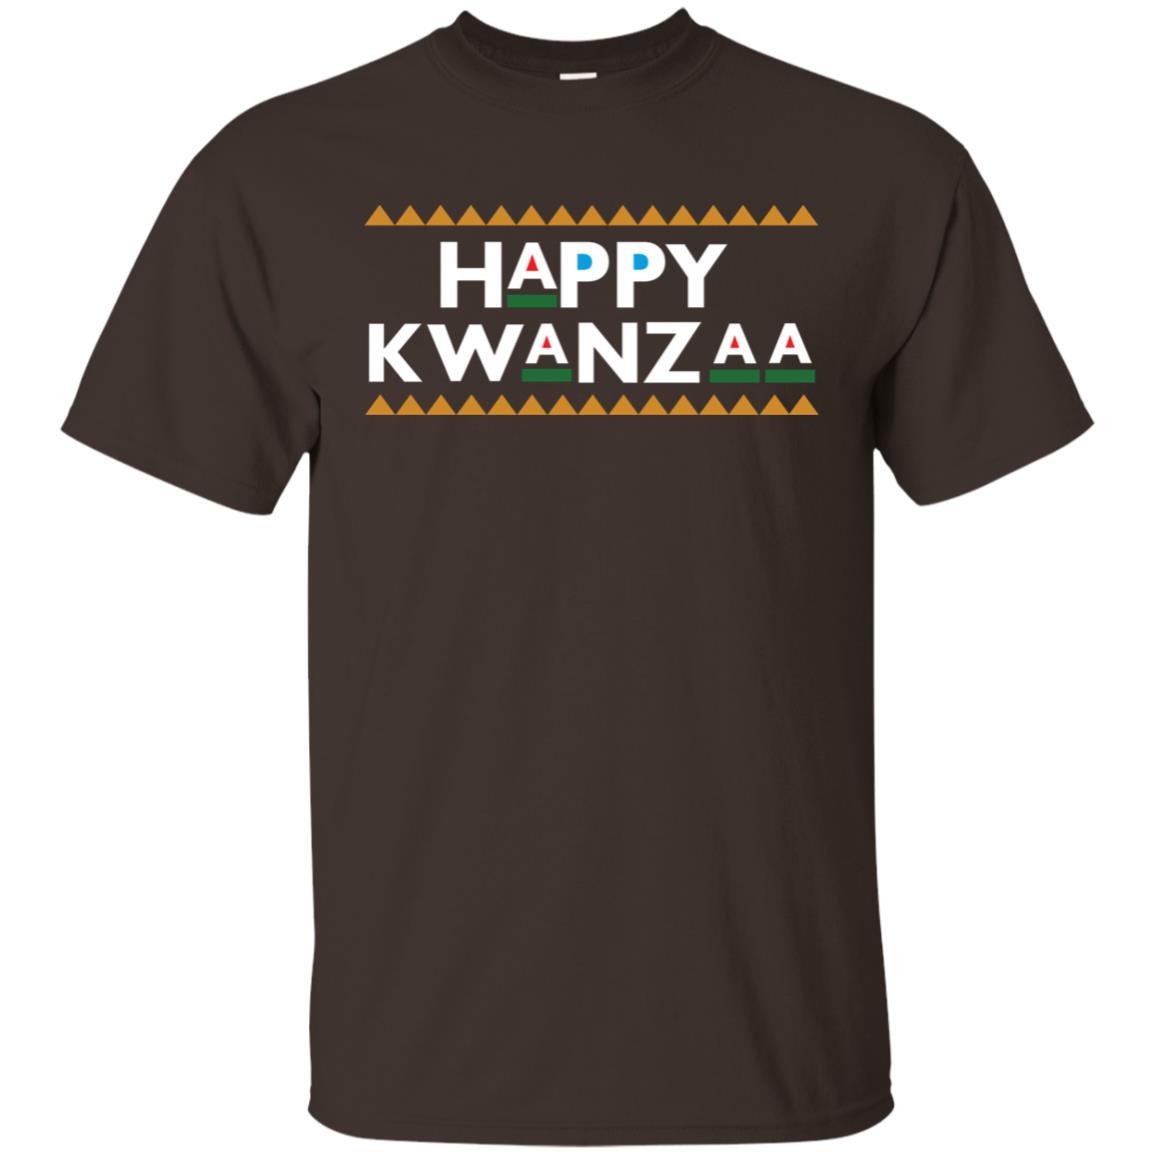 Happy Kwanzaa Retro 90s Font Unisex Short Sleeve